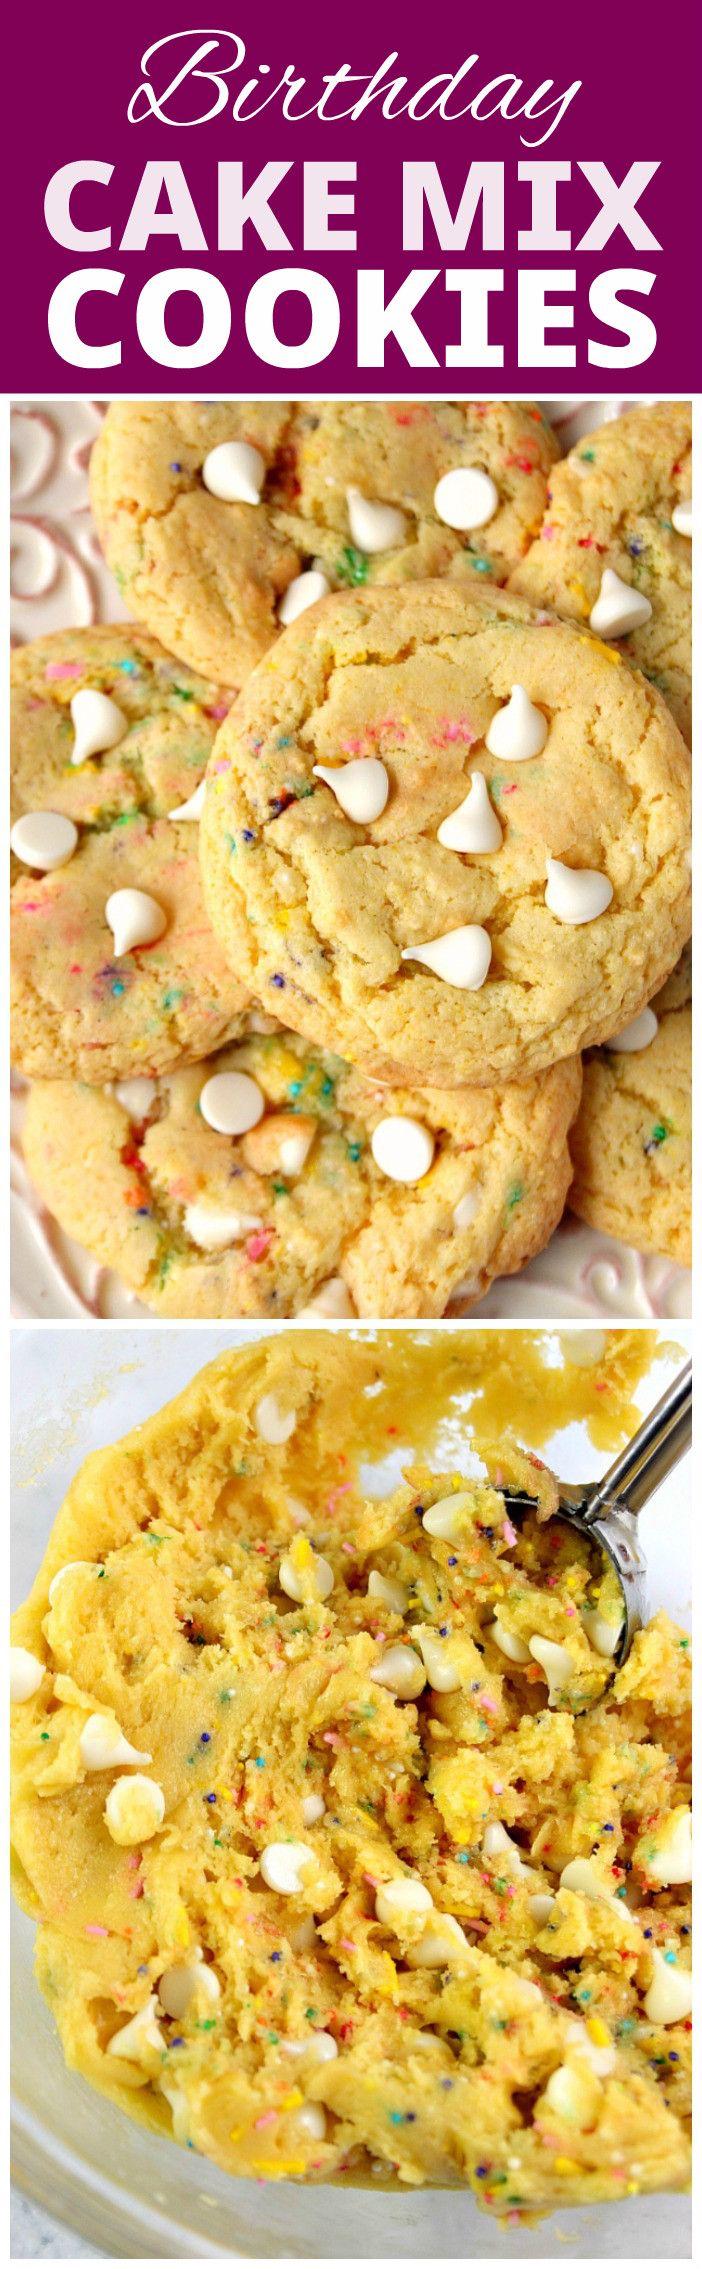 Birthday Cake Mix Cookies Recipe All Things Dessert Pinterest